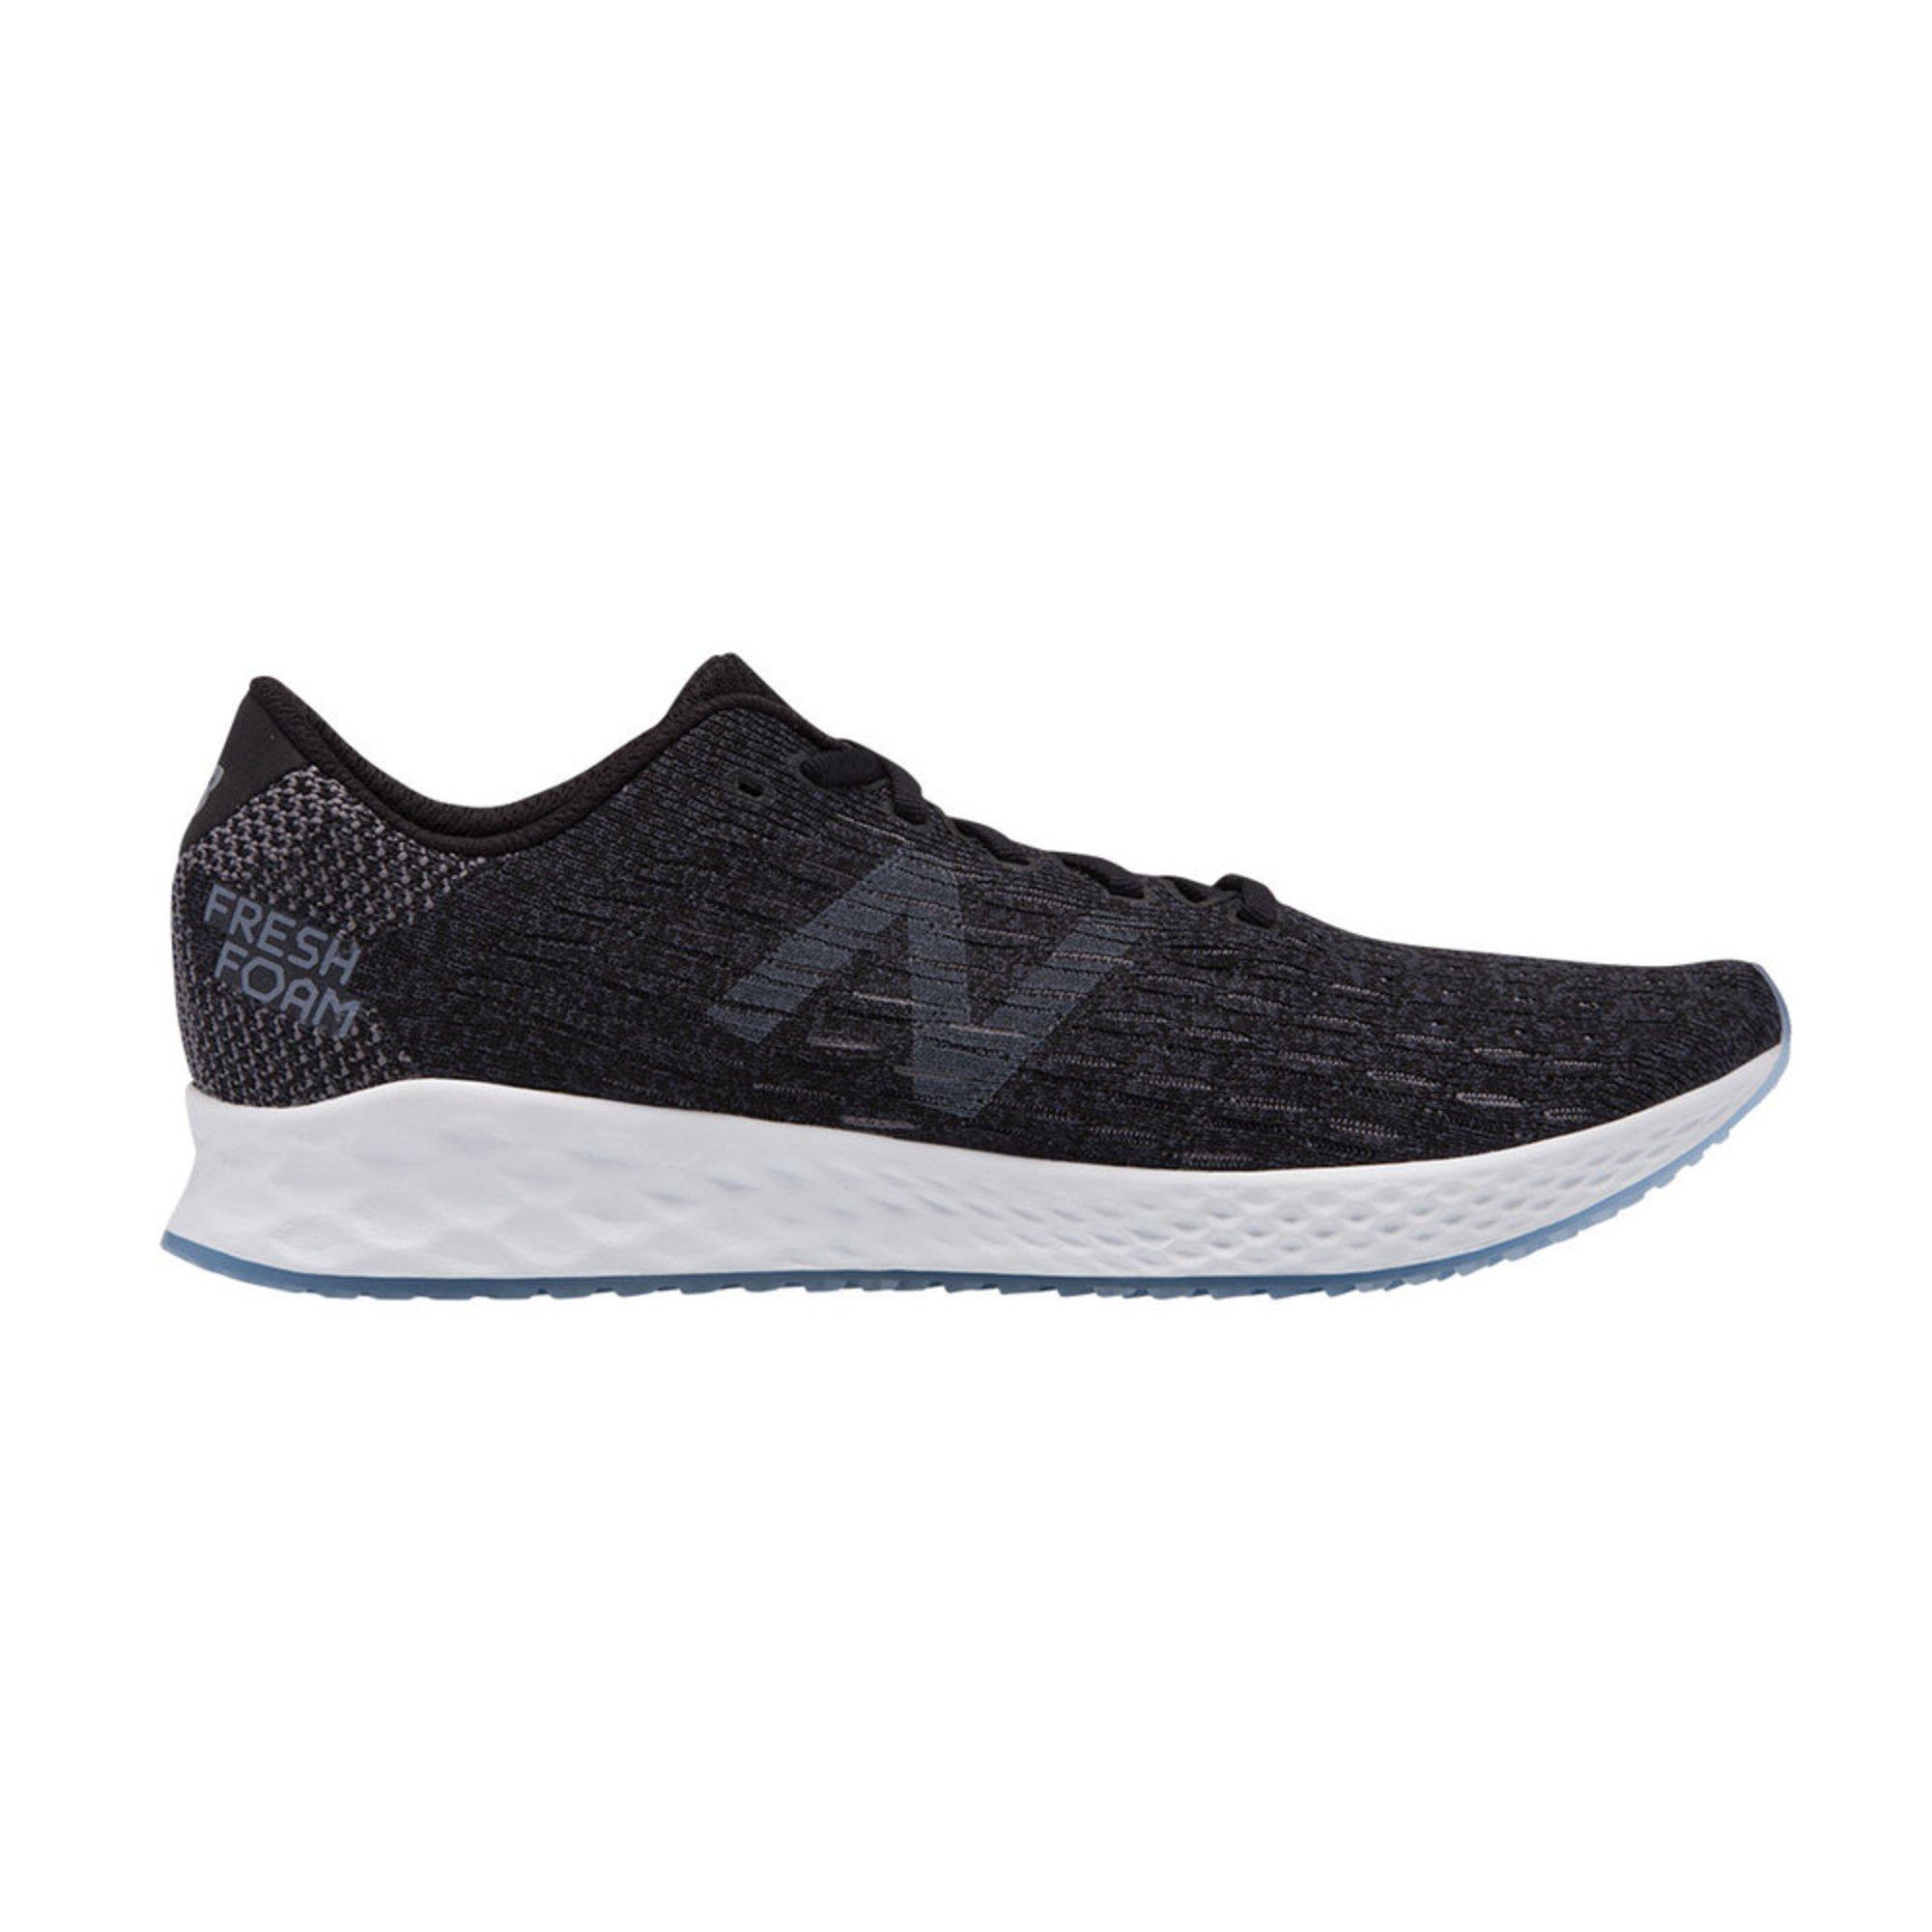 e310f5182636a New Balance Men's Fresh Foam Zante Pursuit Running Shoe | Men's ...